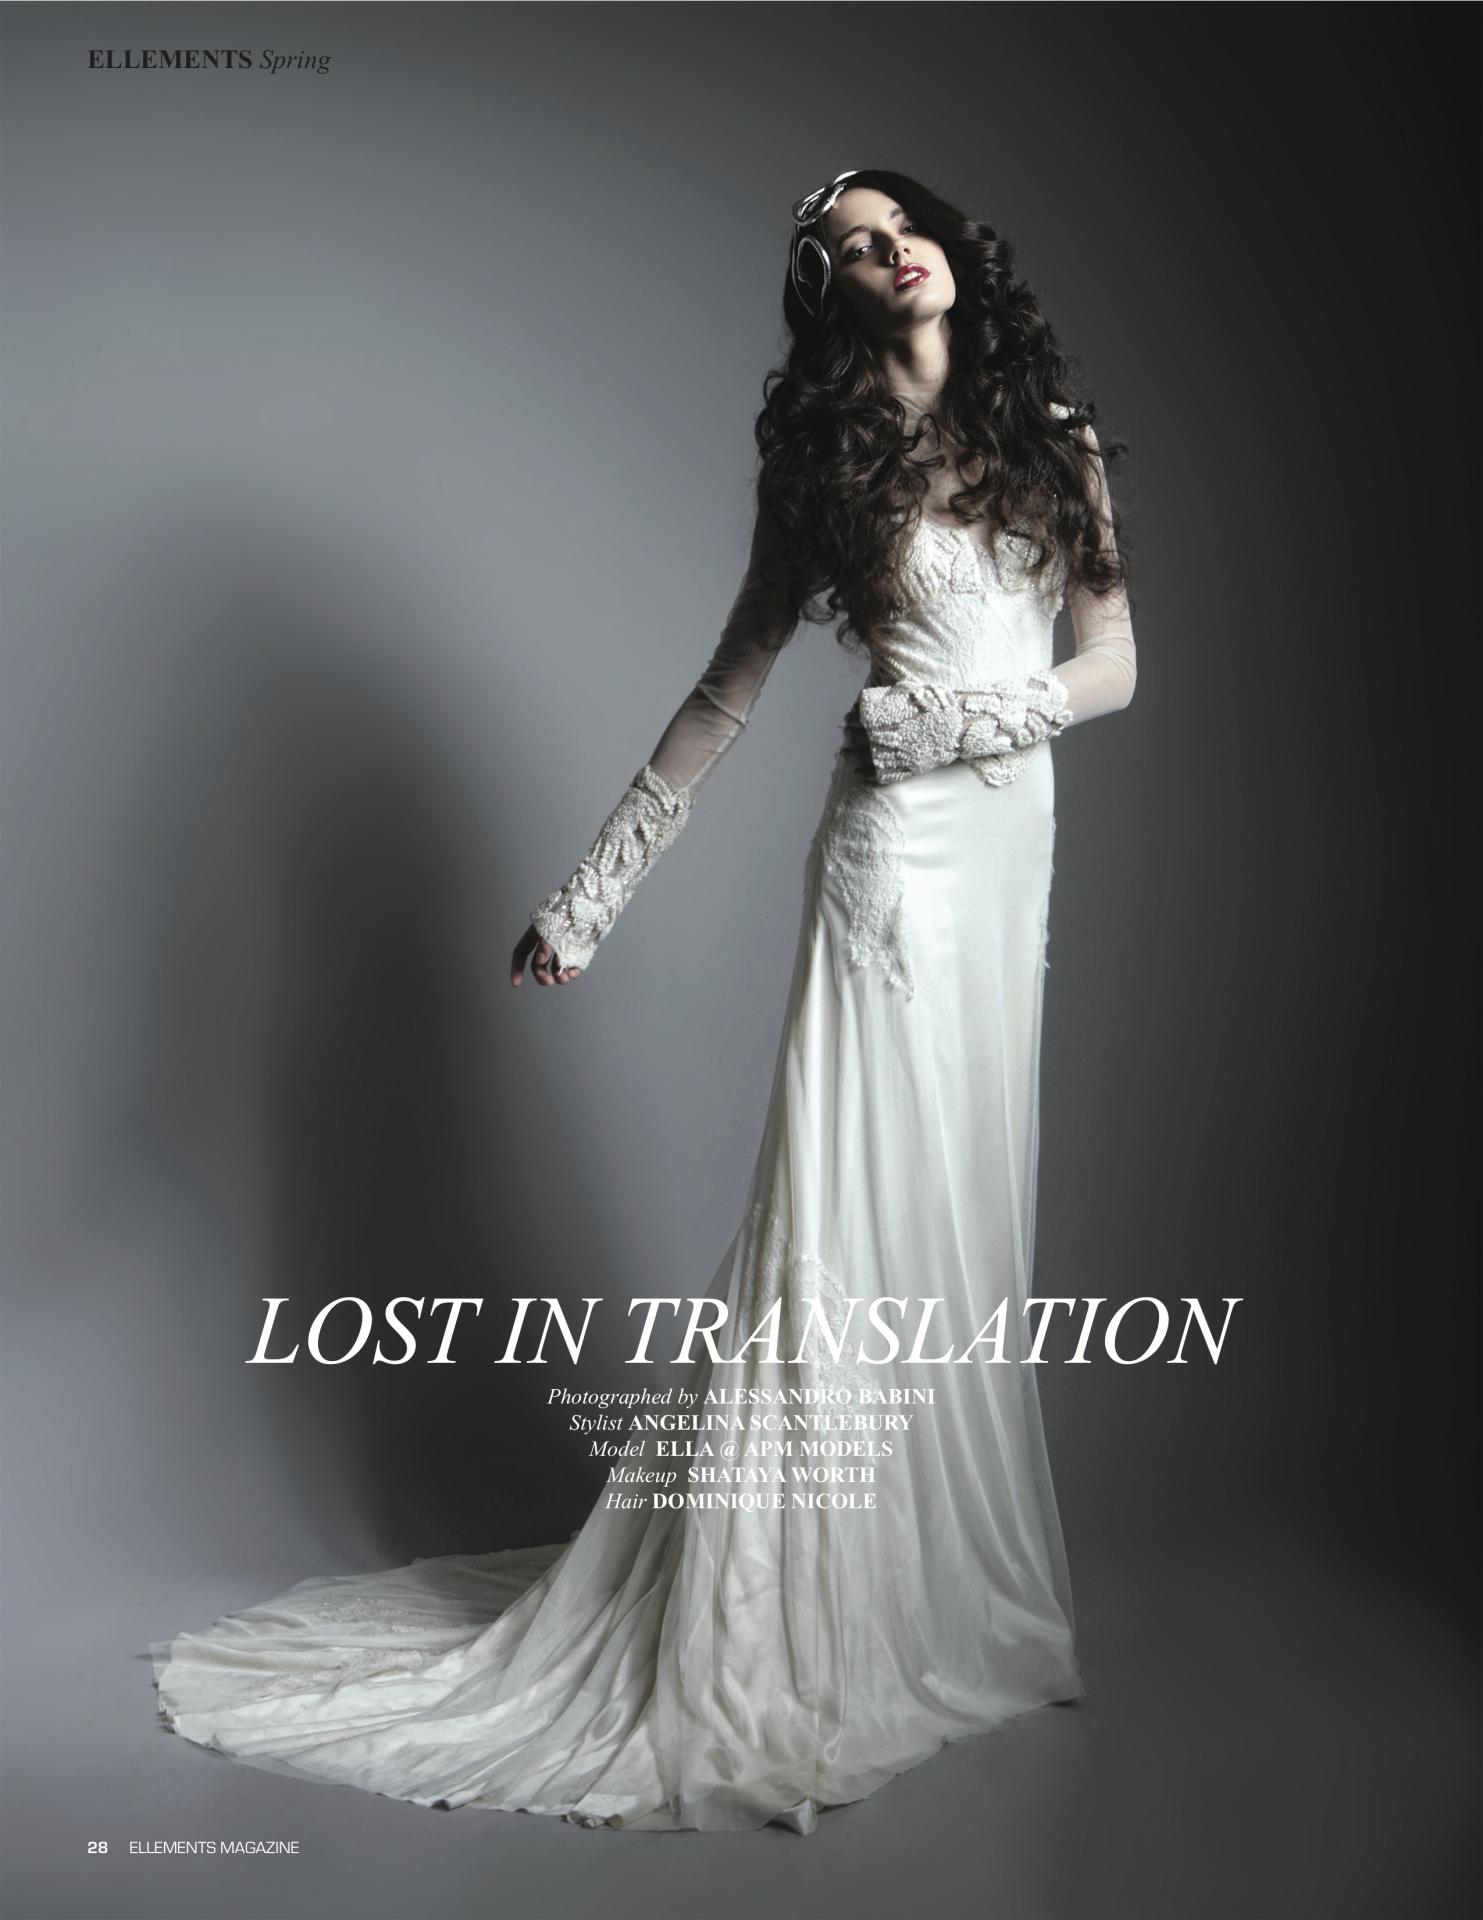 Ellements Magazine, Spring